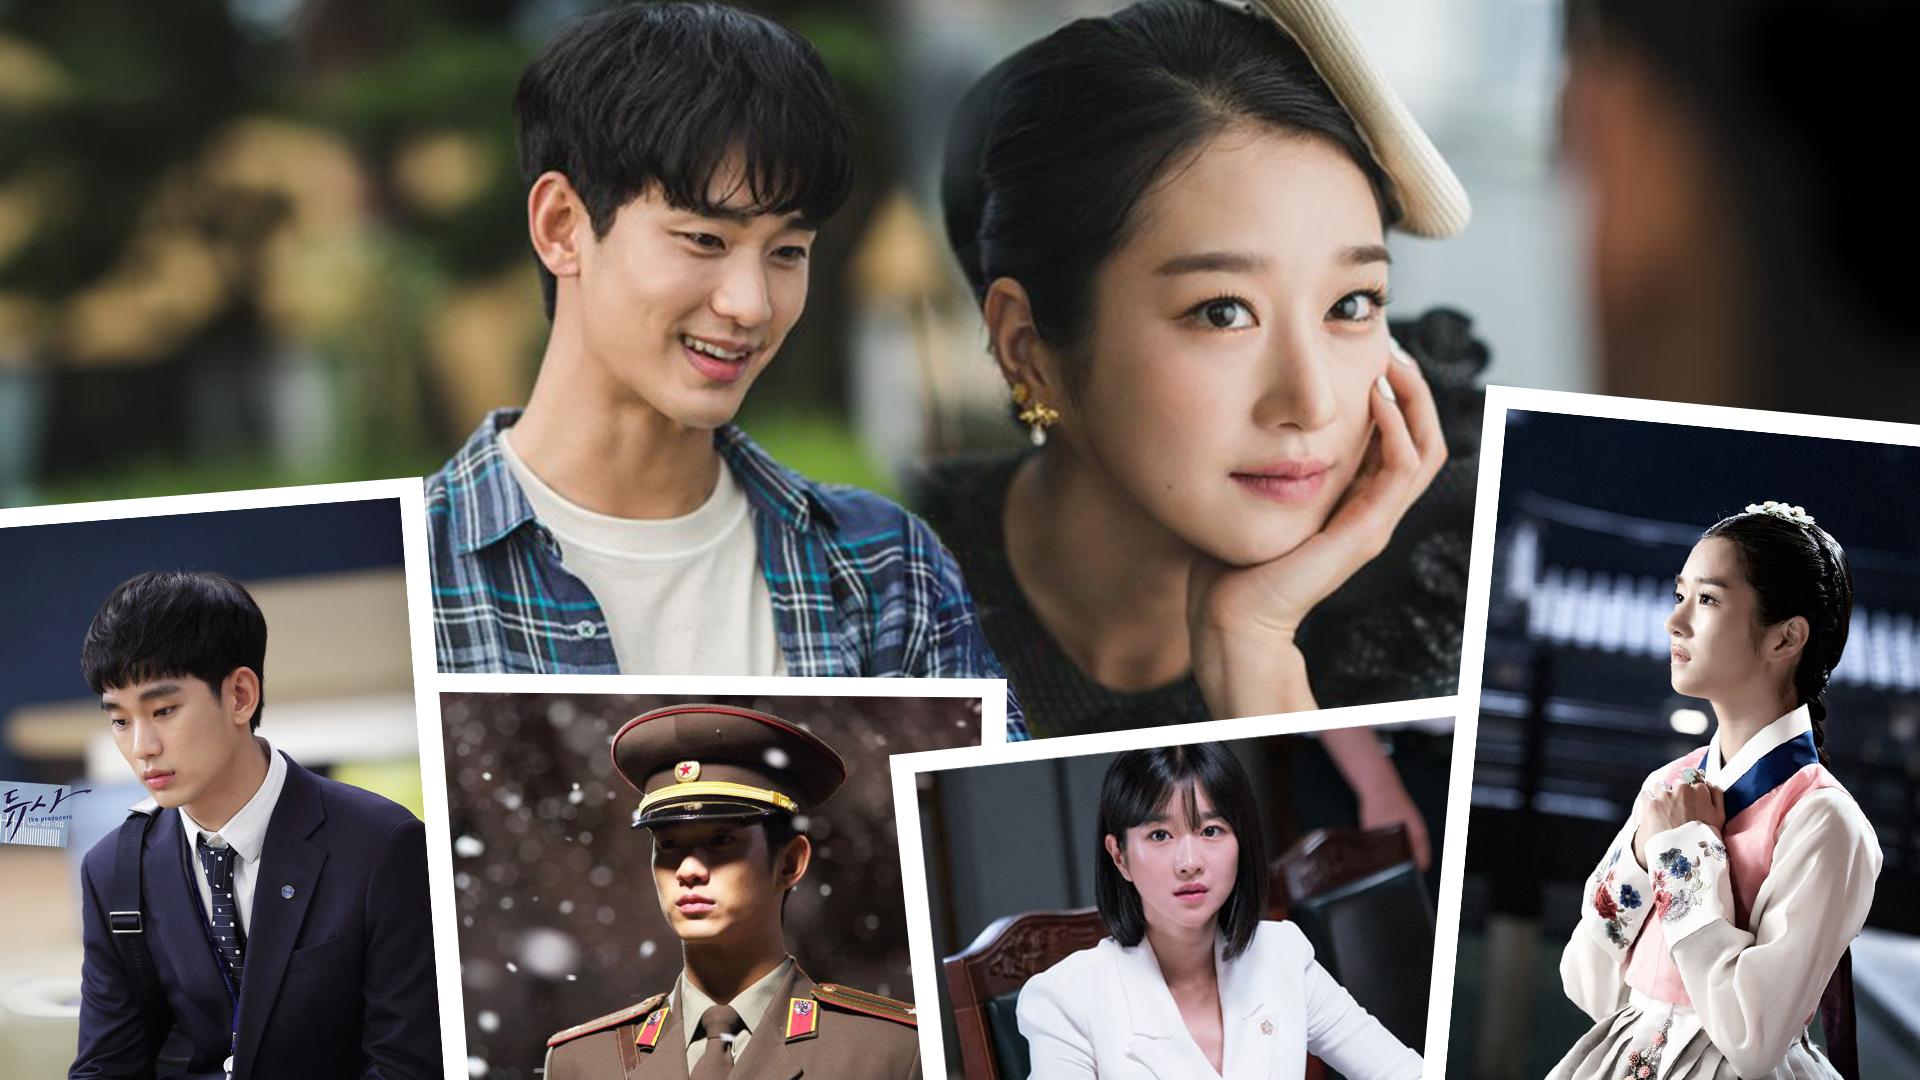 Korean Dramas of Kim Soo Hyun and Seo Ye Ji To Watch If You Can't Get Over 'It's Okay to Not Be Okay'